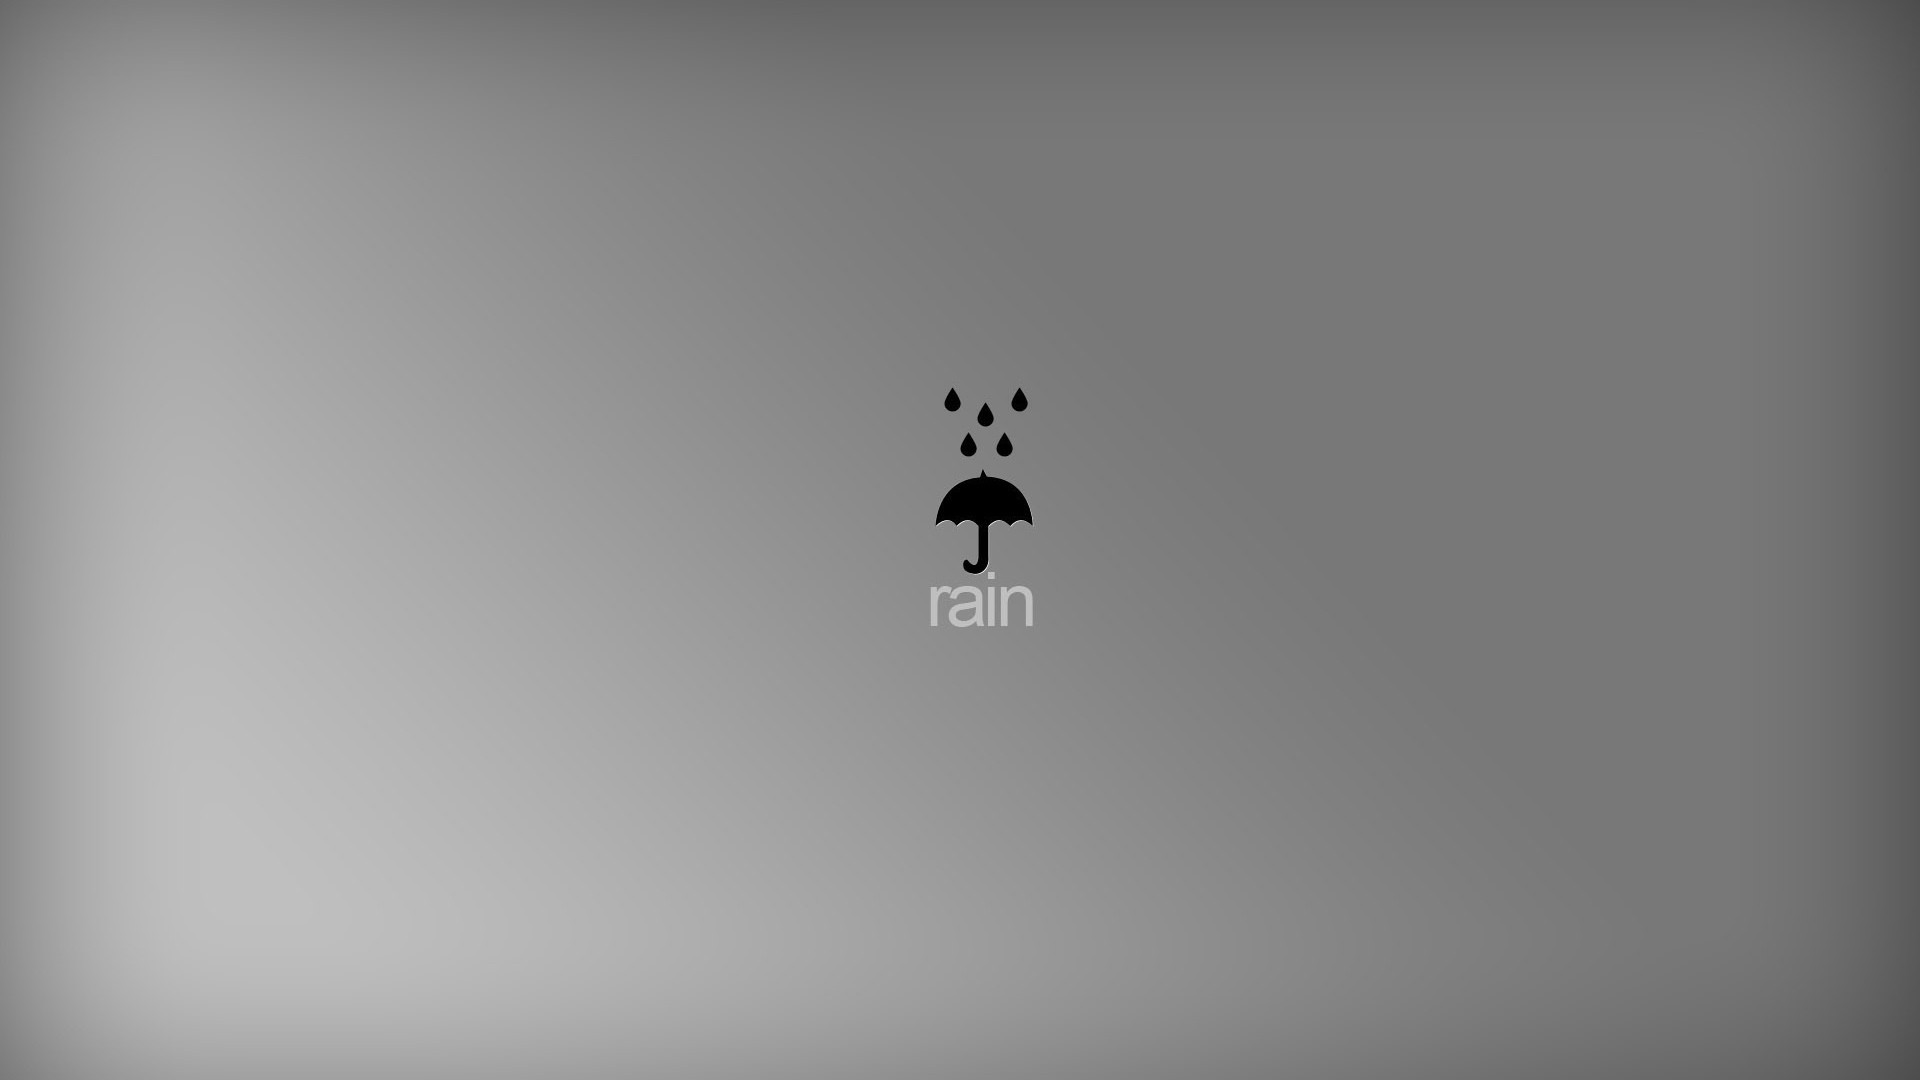 Rain Minimalist Background